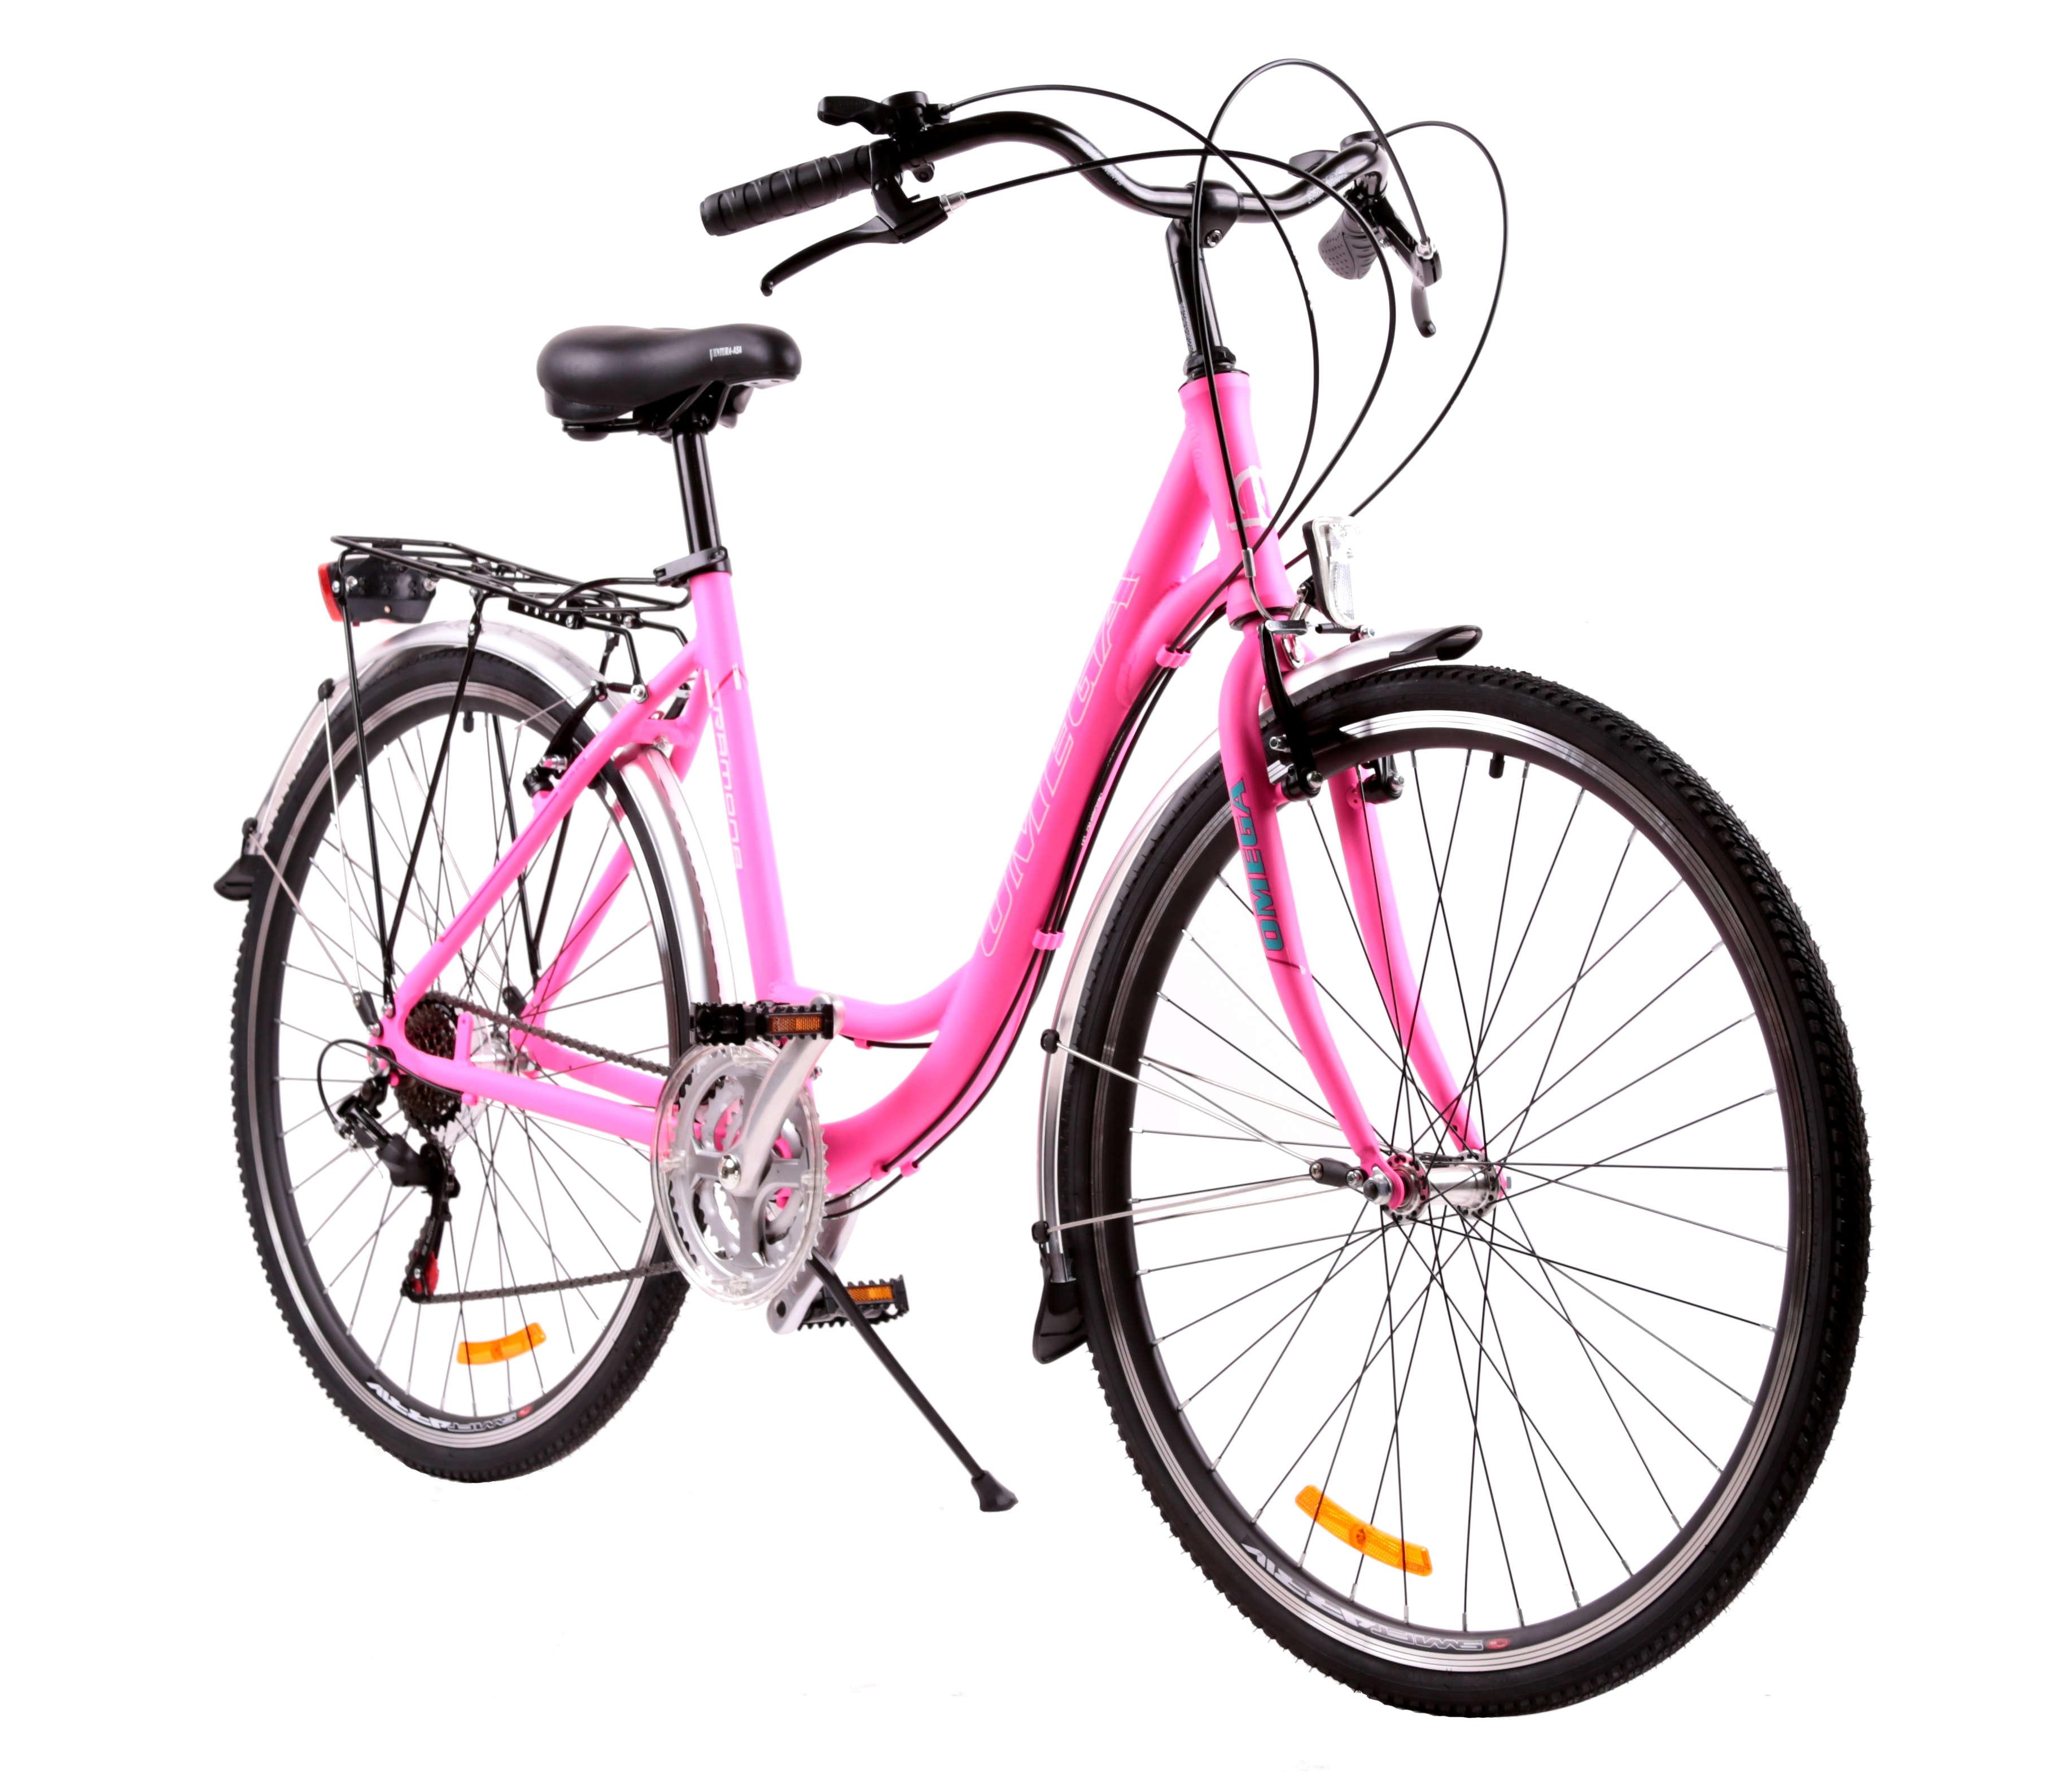 8a7113802b9 Градски велосипед Omega 28